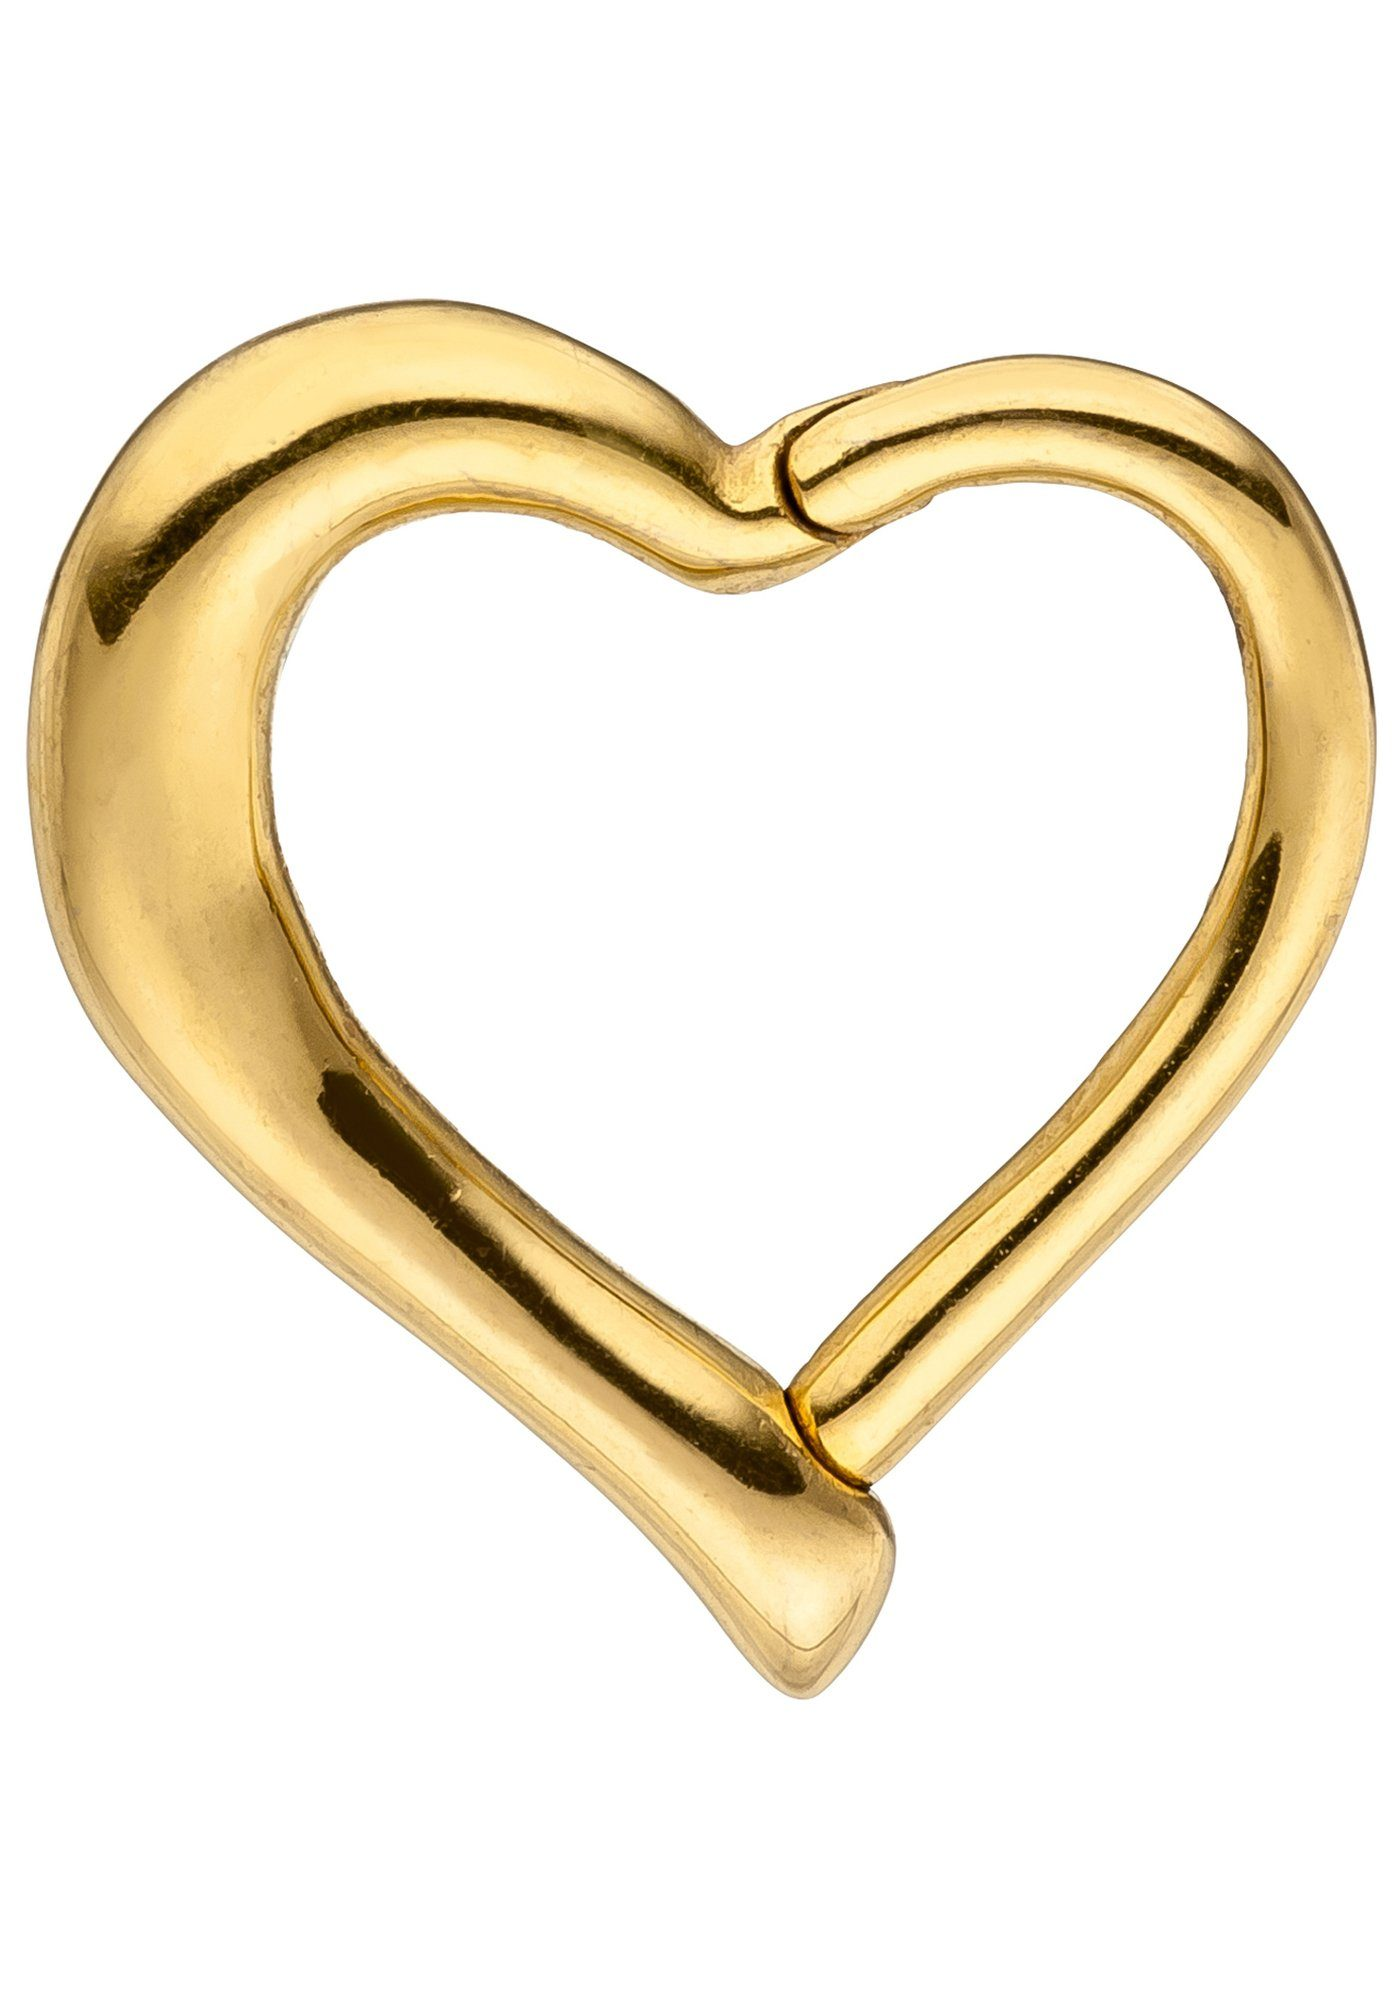 JOBO Nasenpiercing Segmentring Herz Edelstahl goldfarben